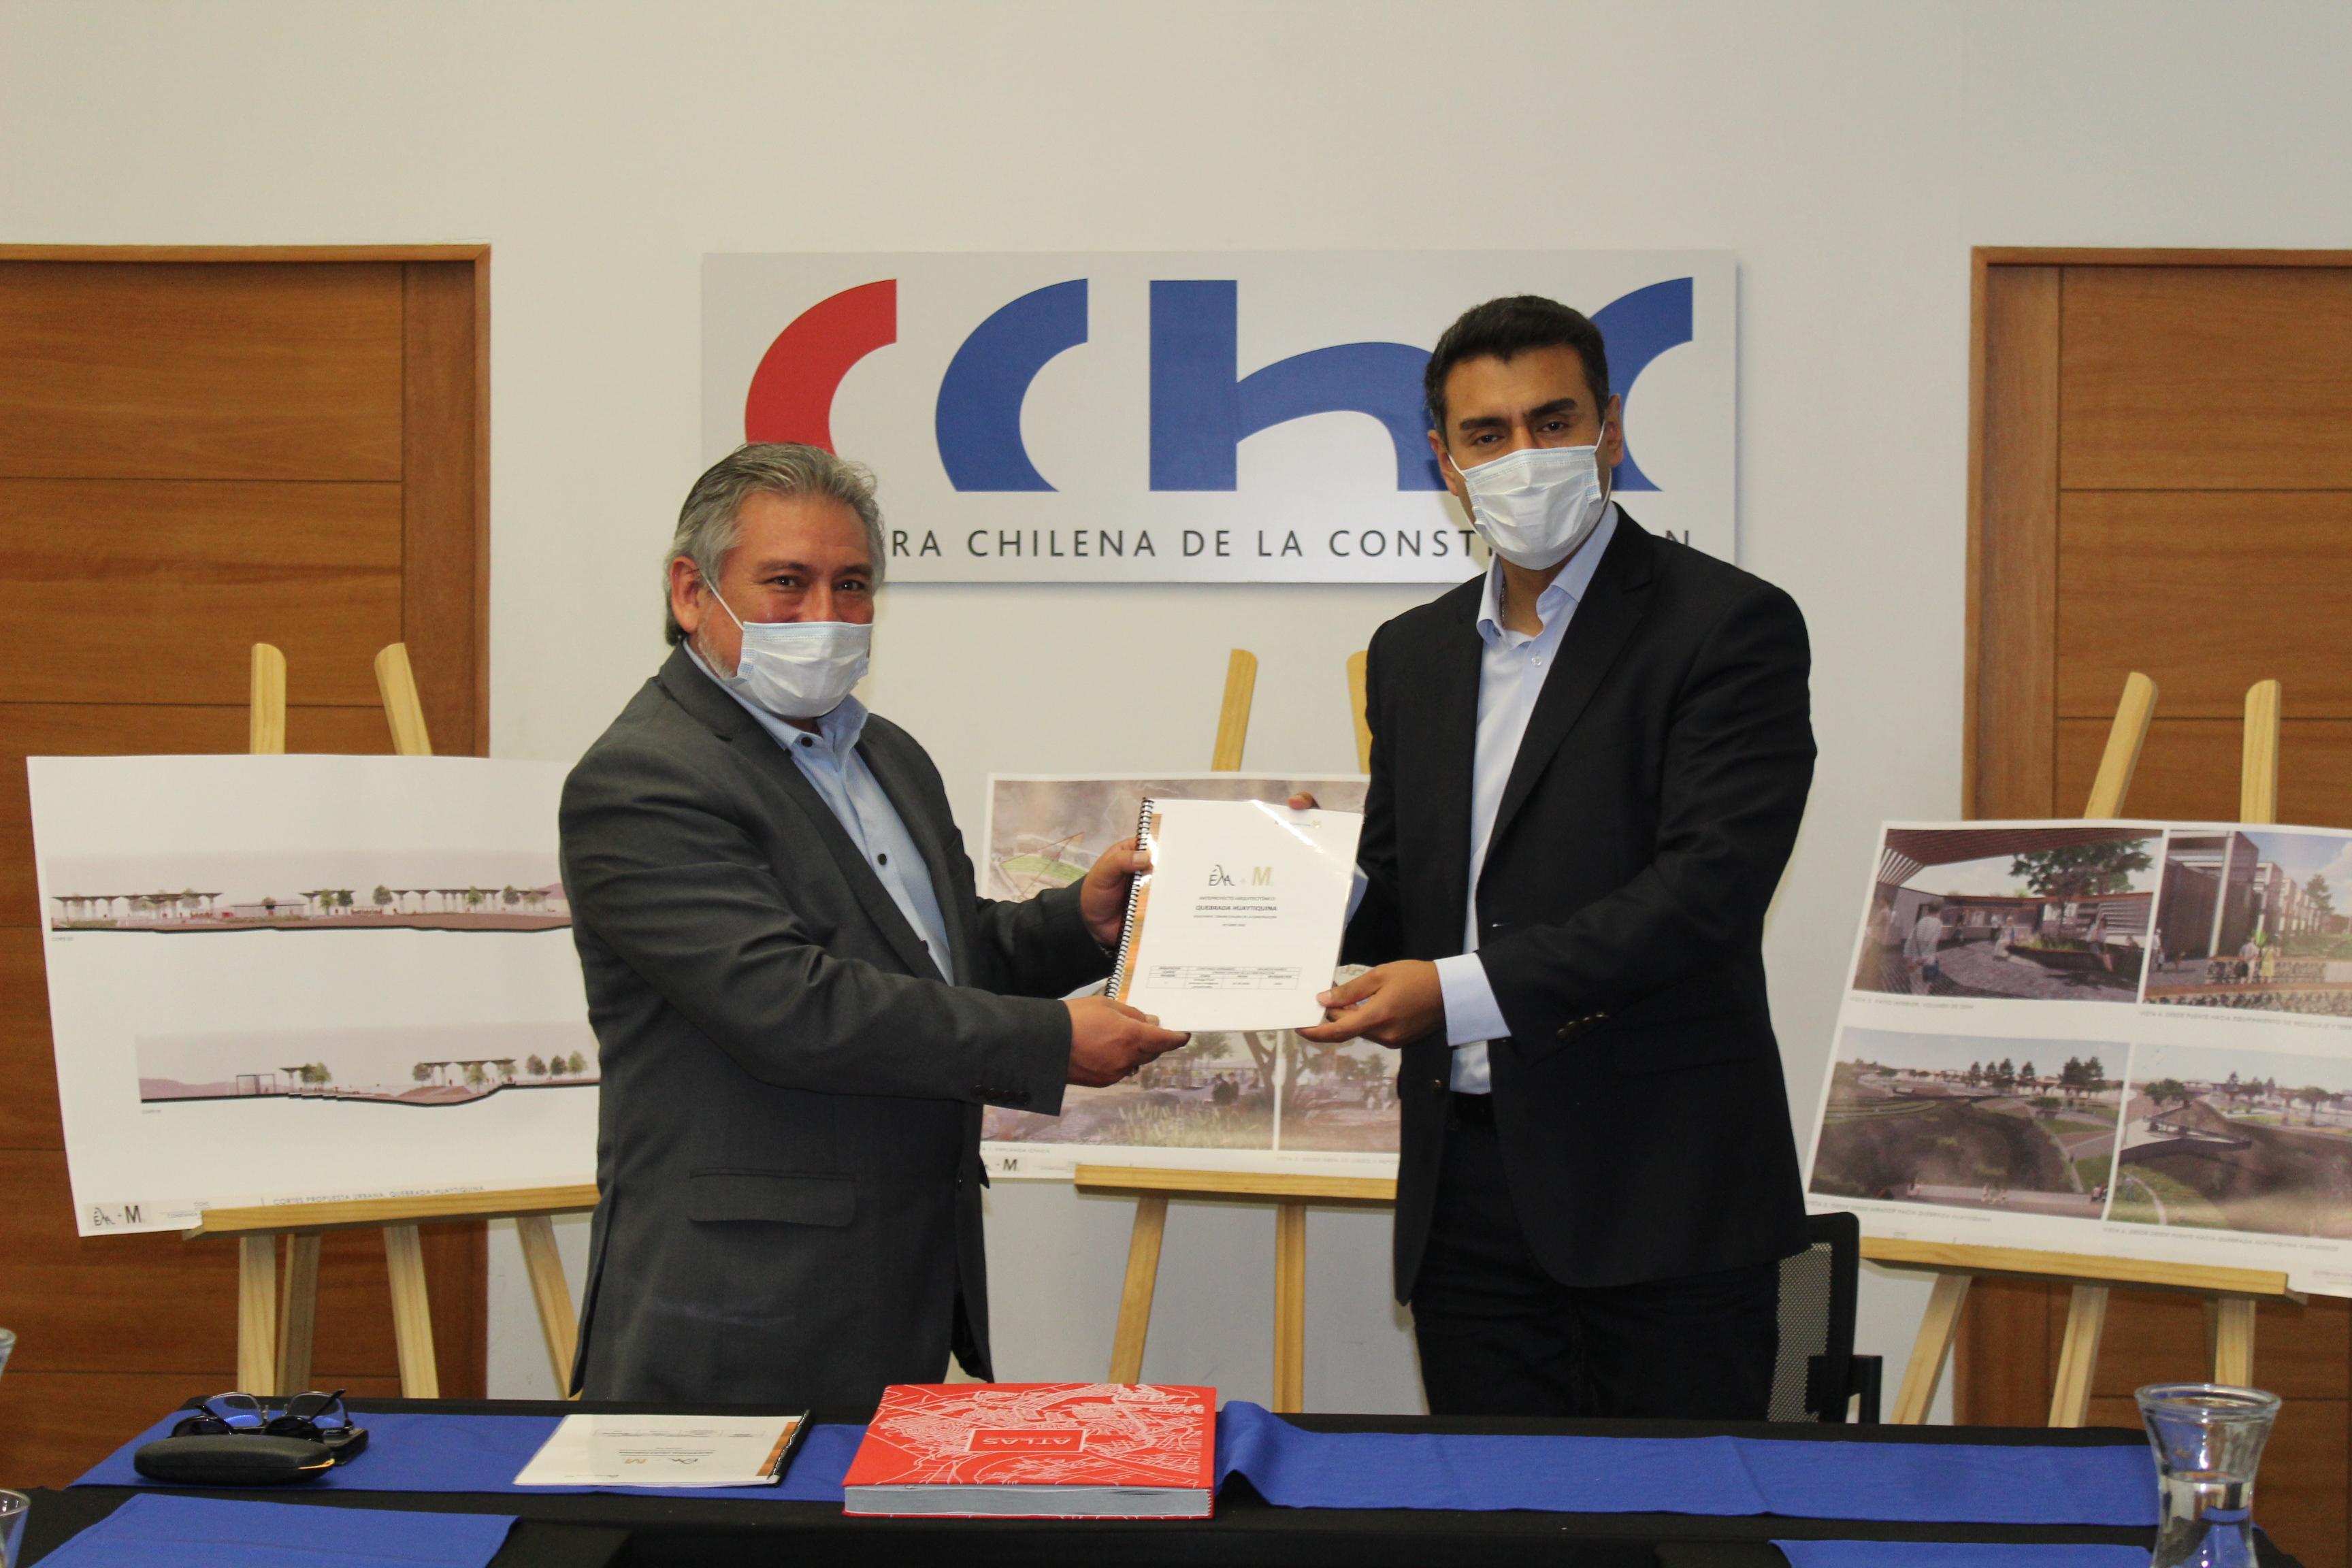 CChC Calama y municipio impulsarán iniciativa para recuperar la Quebrada Huaytiquina noticias